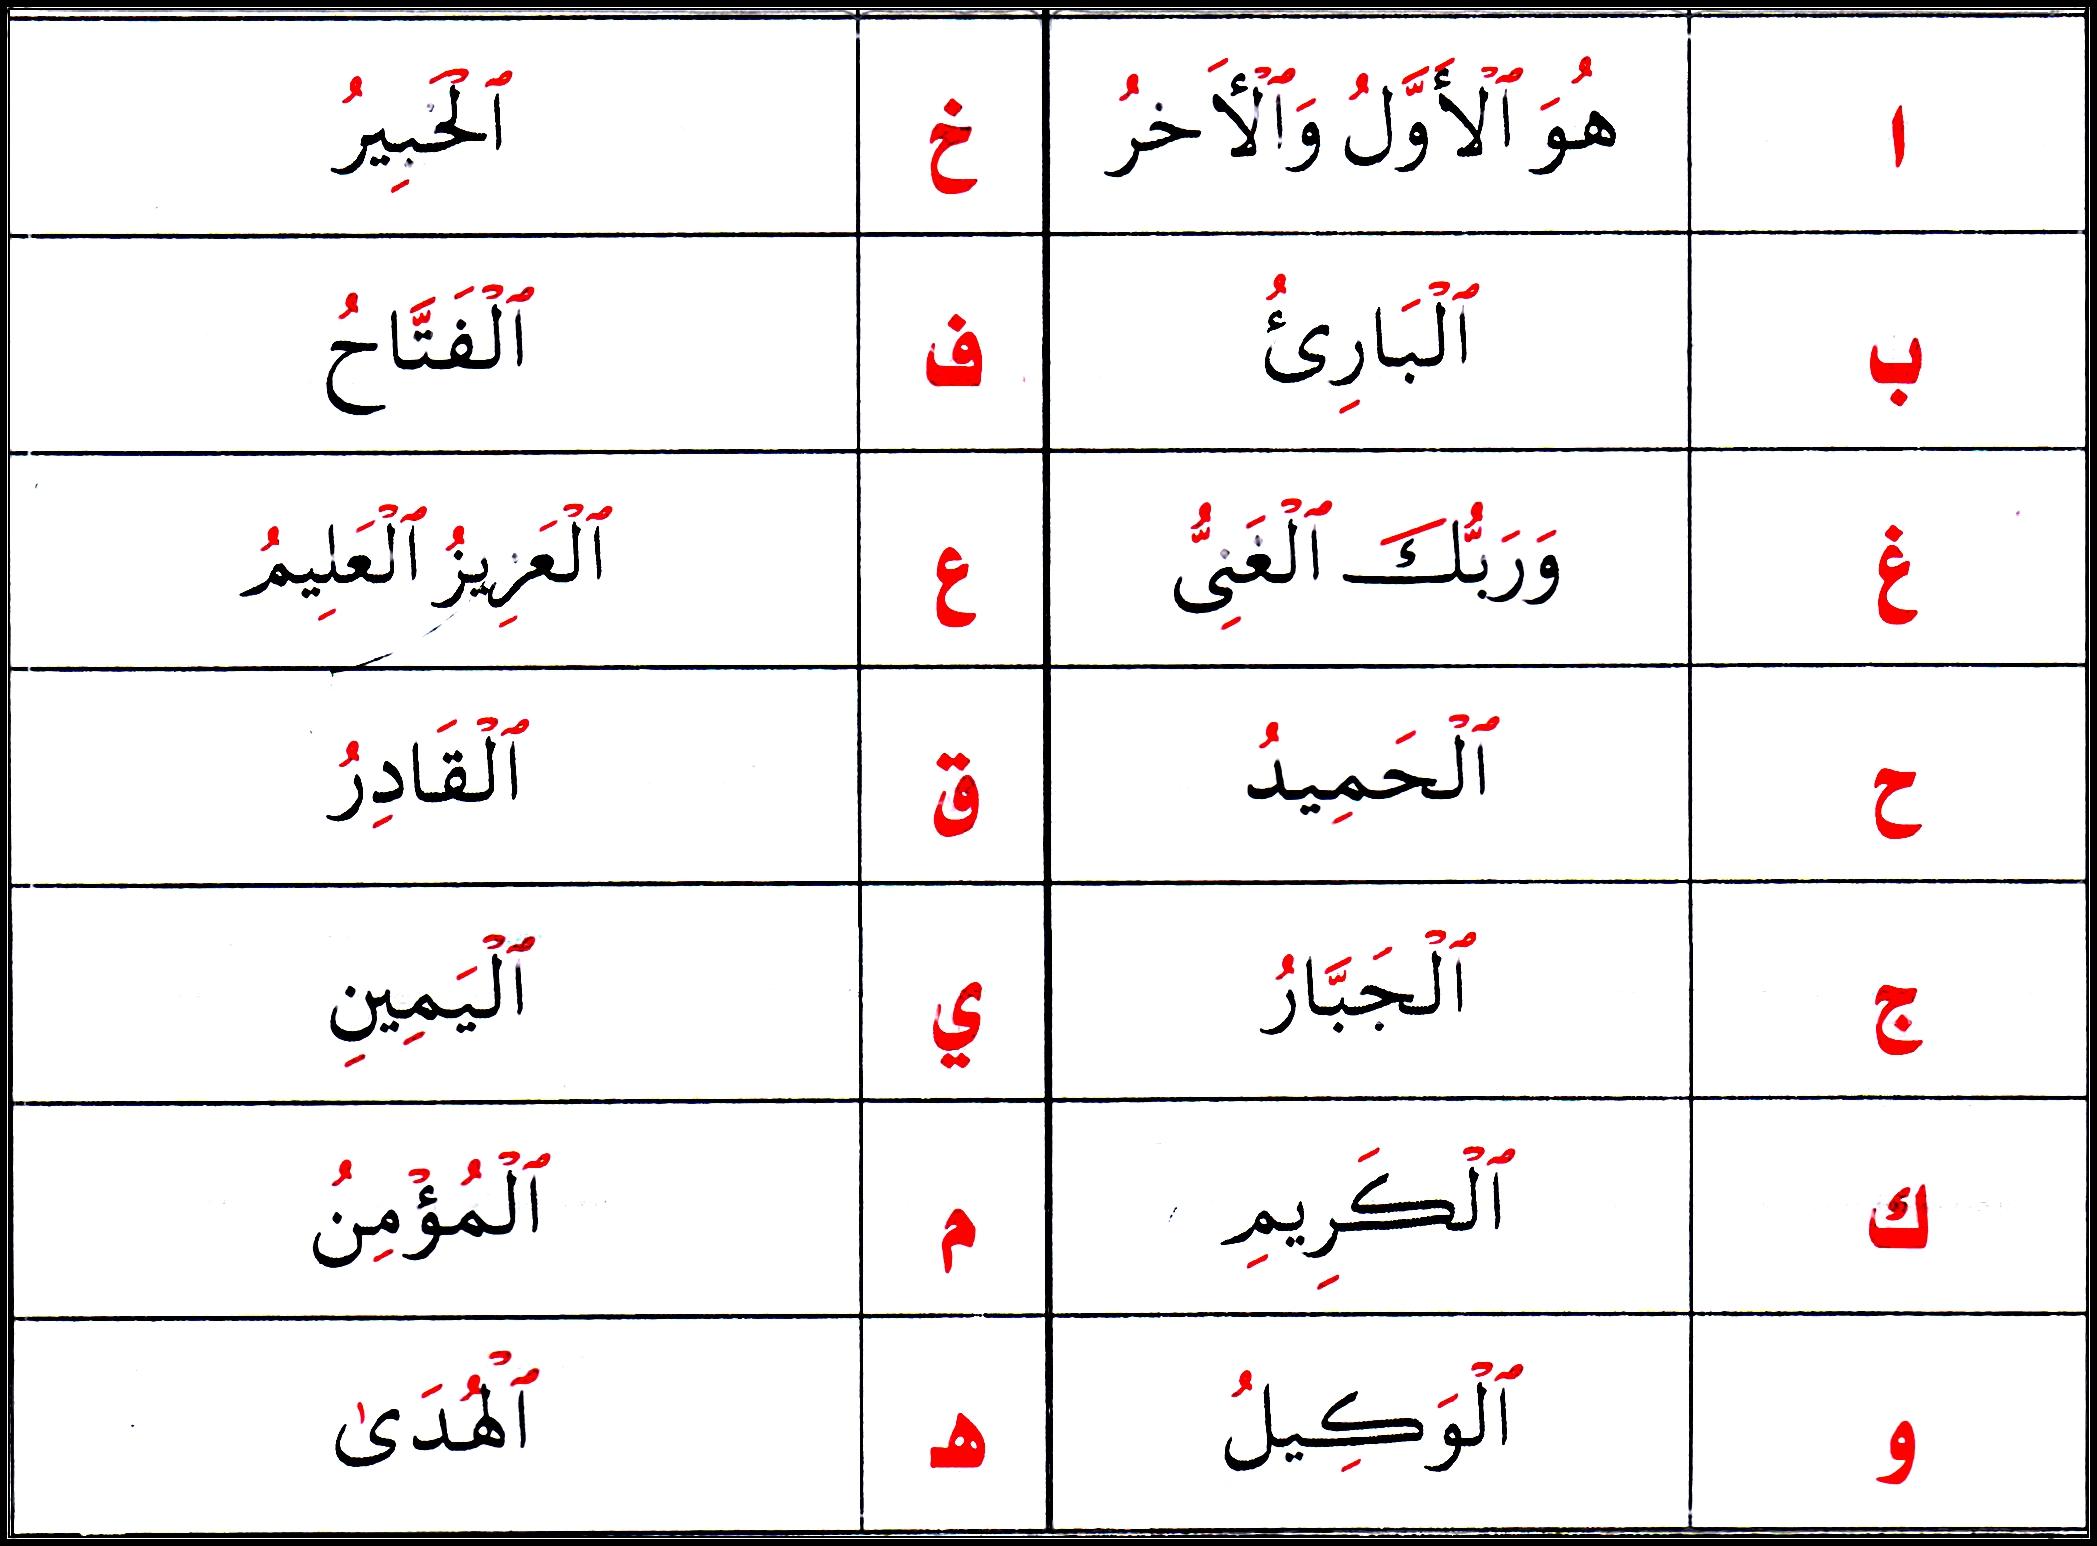 The Rules Of Laam Al Qamariyyah And Laam As Shamsiyyah